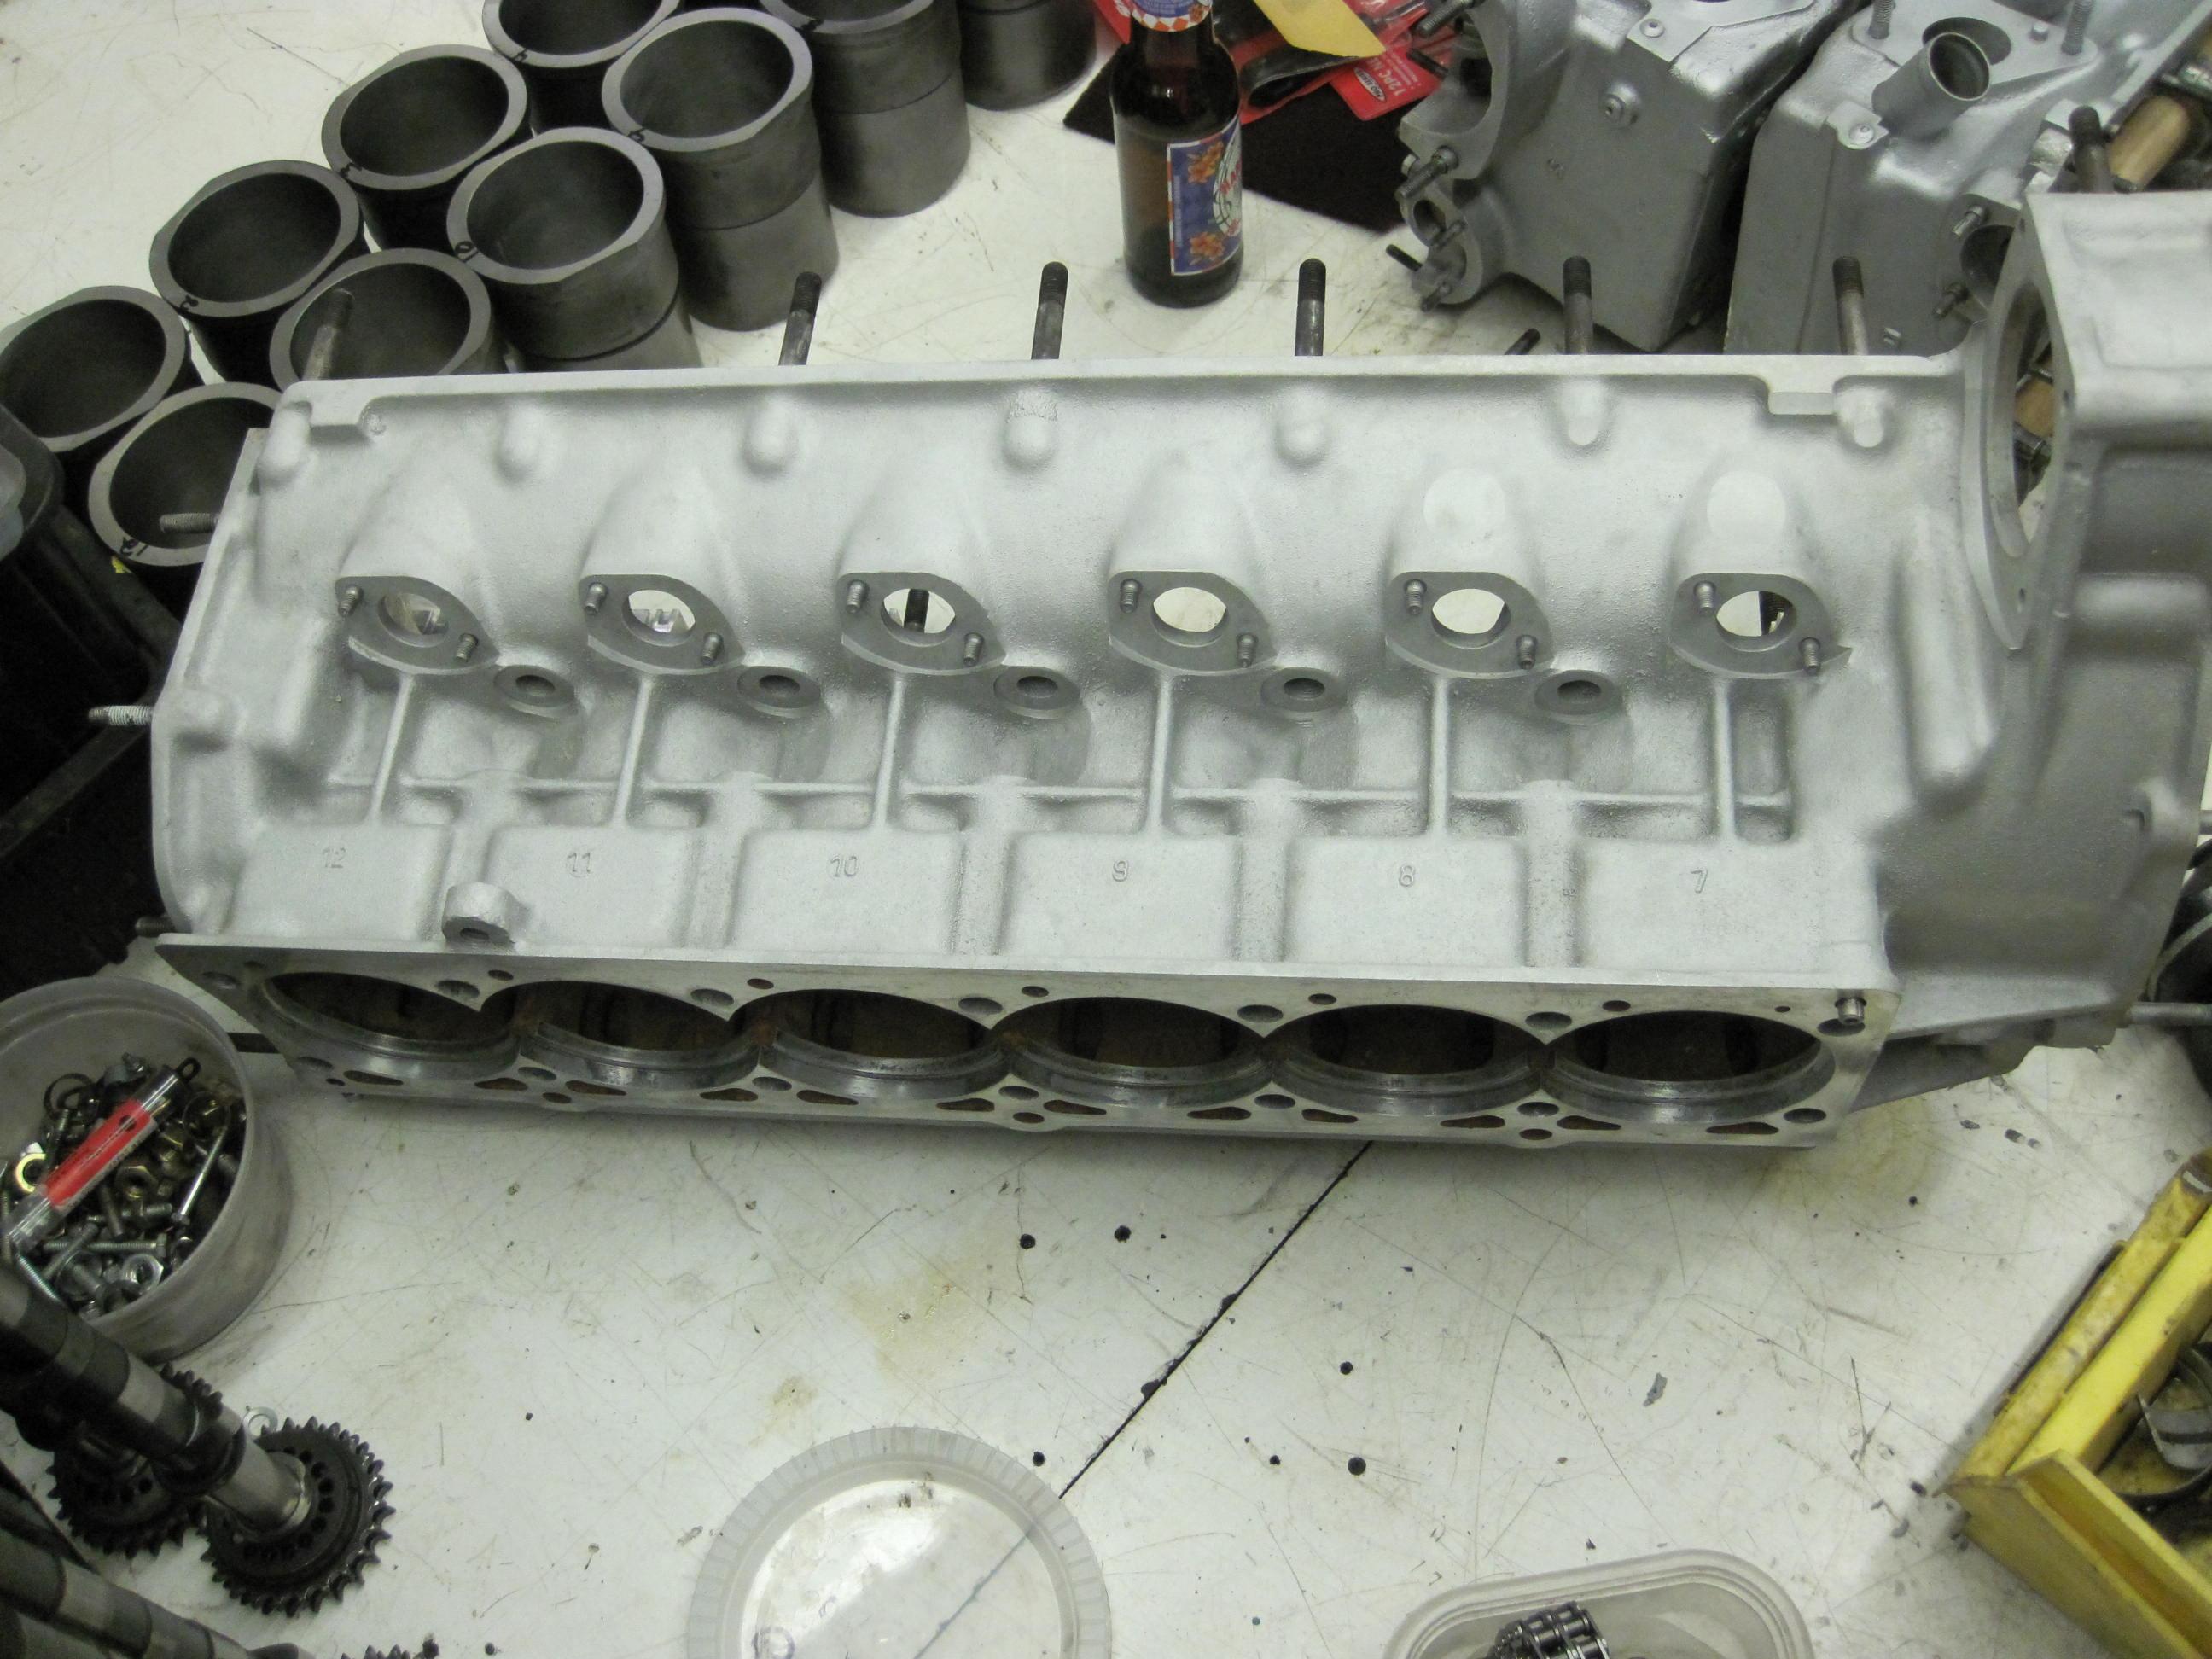 Ferrari 512BB engine overhaul